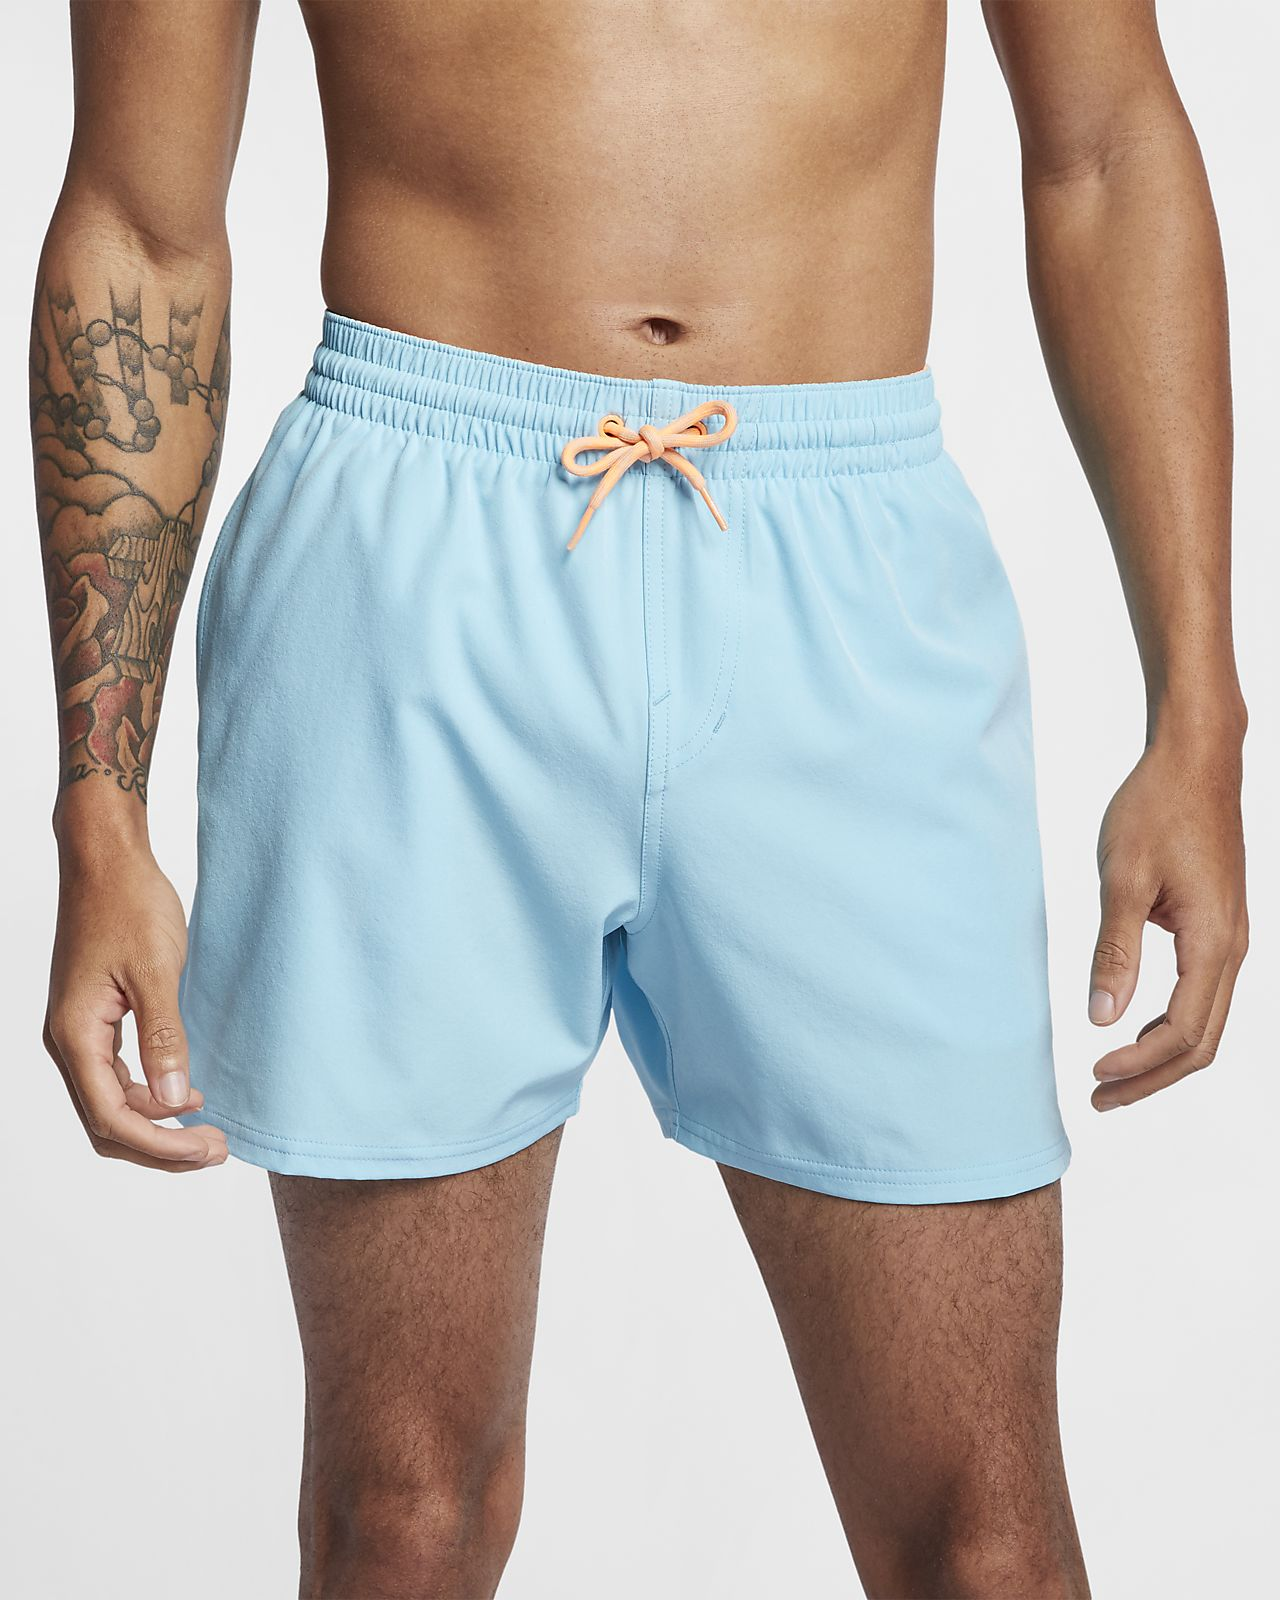 Nike Swim Retro Stripe Lap Men's 13cm (approx.) Swimming Trunks